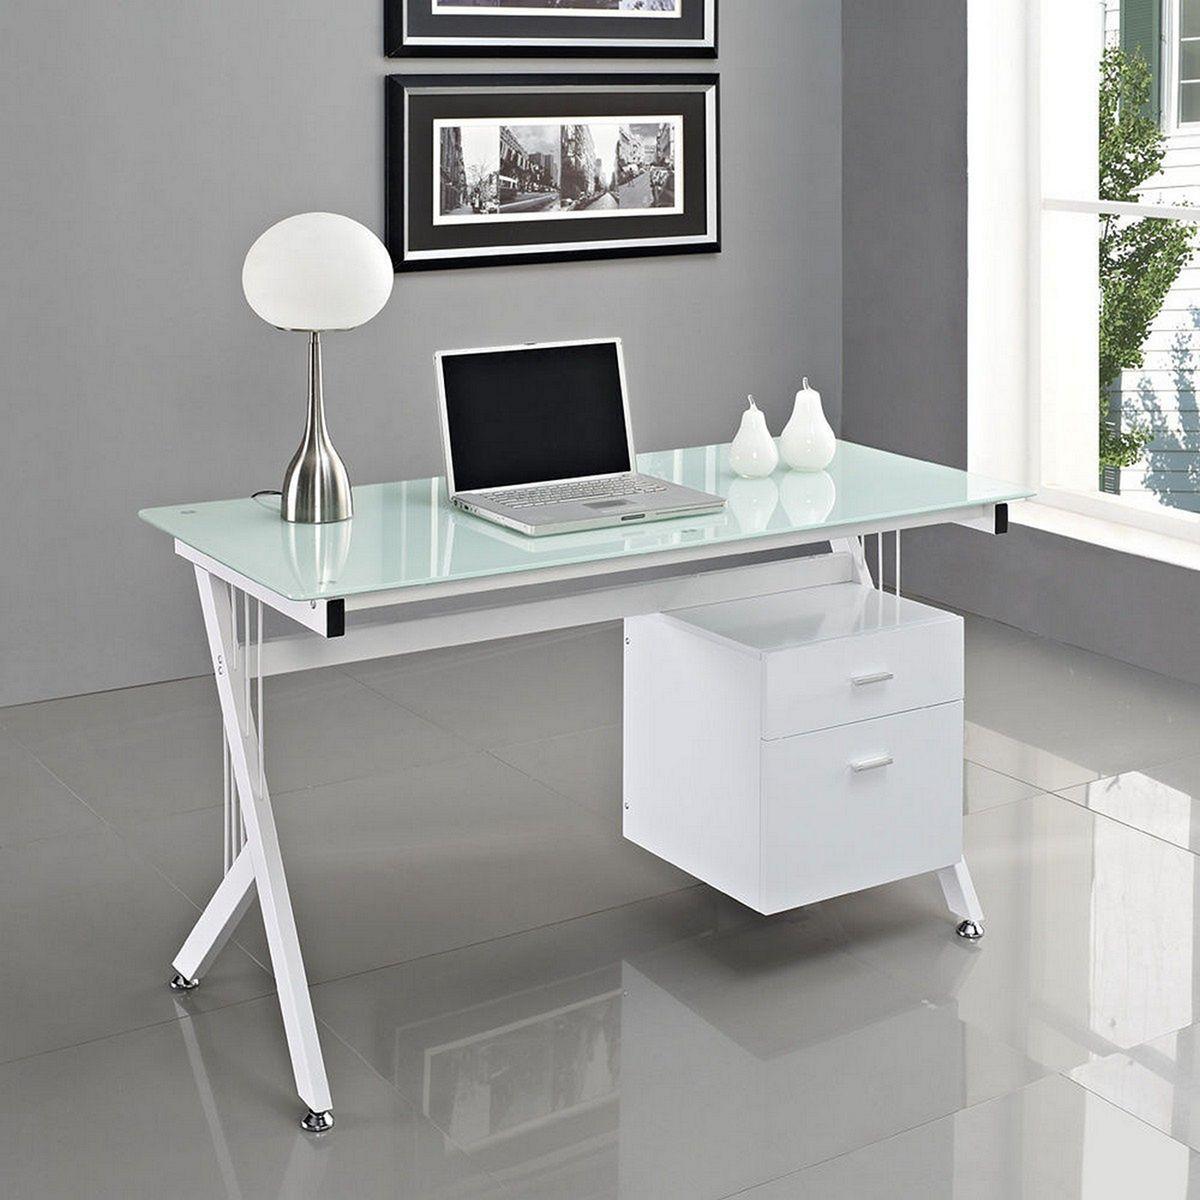 Best Furniture Desks Ideas For Your Home Offices 30 Best Pictures Freshouz Com Computer Desks For Home White Desk Office Best Home Office Desk